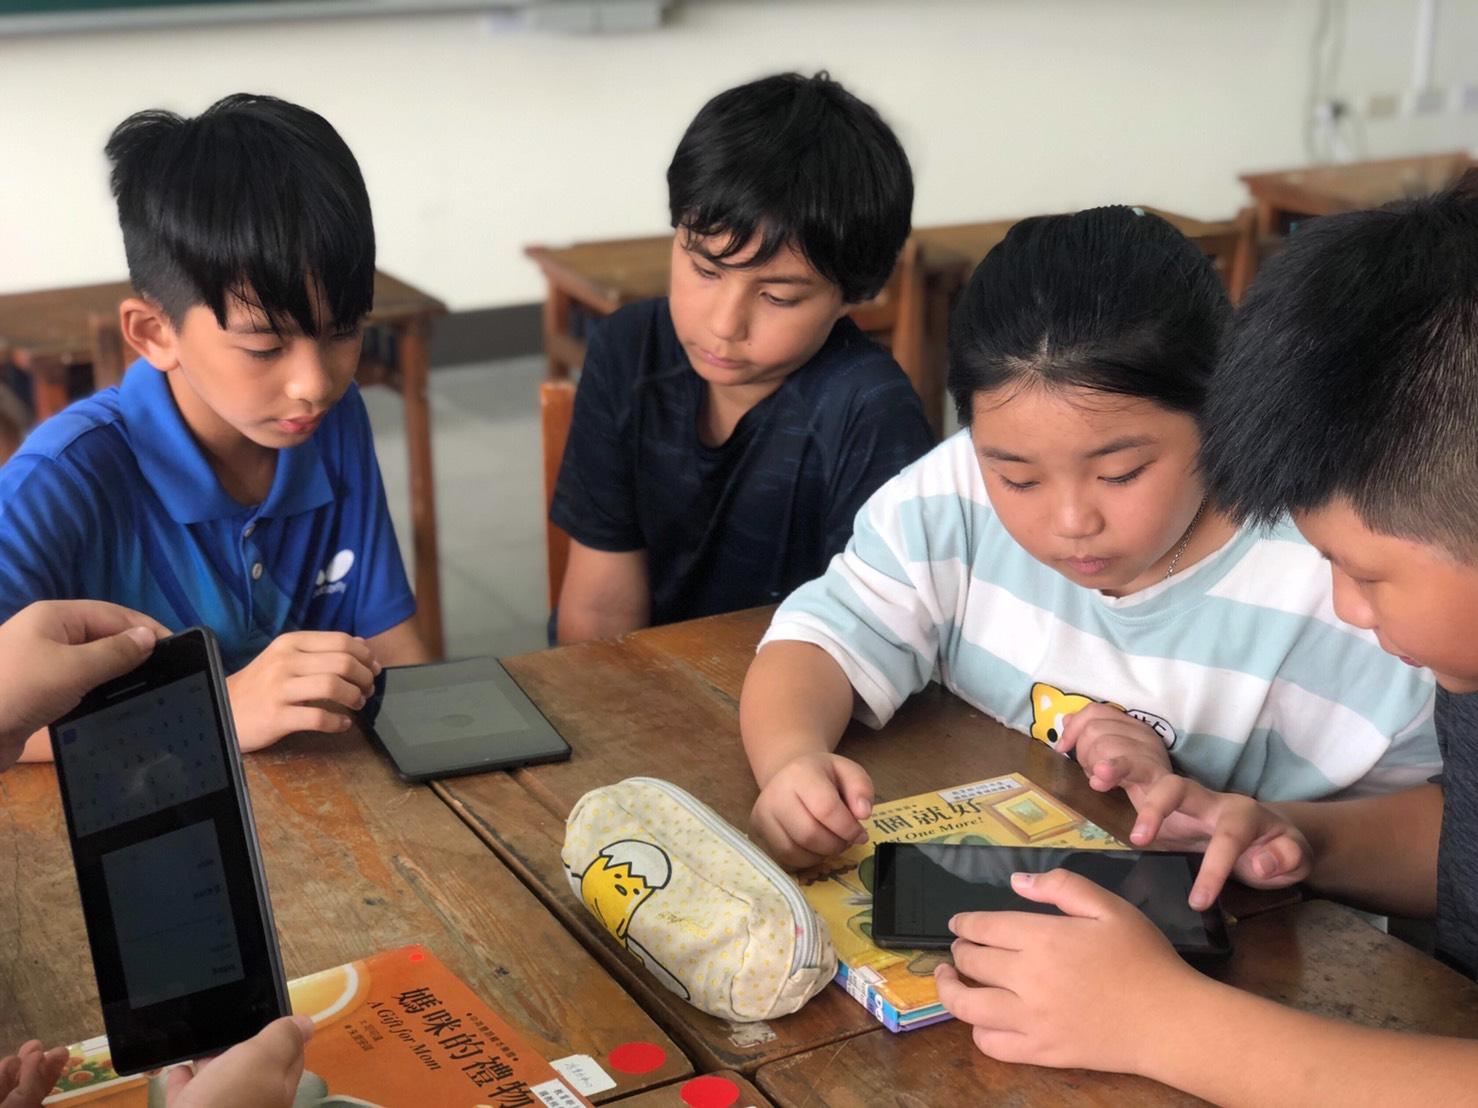 Ford 藉由『對抗新冠疫情募款計畫』使 TFT 能夠透過平板電腦的採購,在抗疫的路上,無縫接軌地幫助孩子們遠距學習。